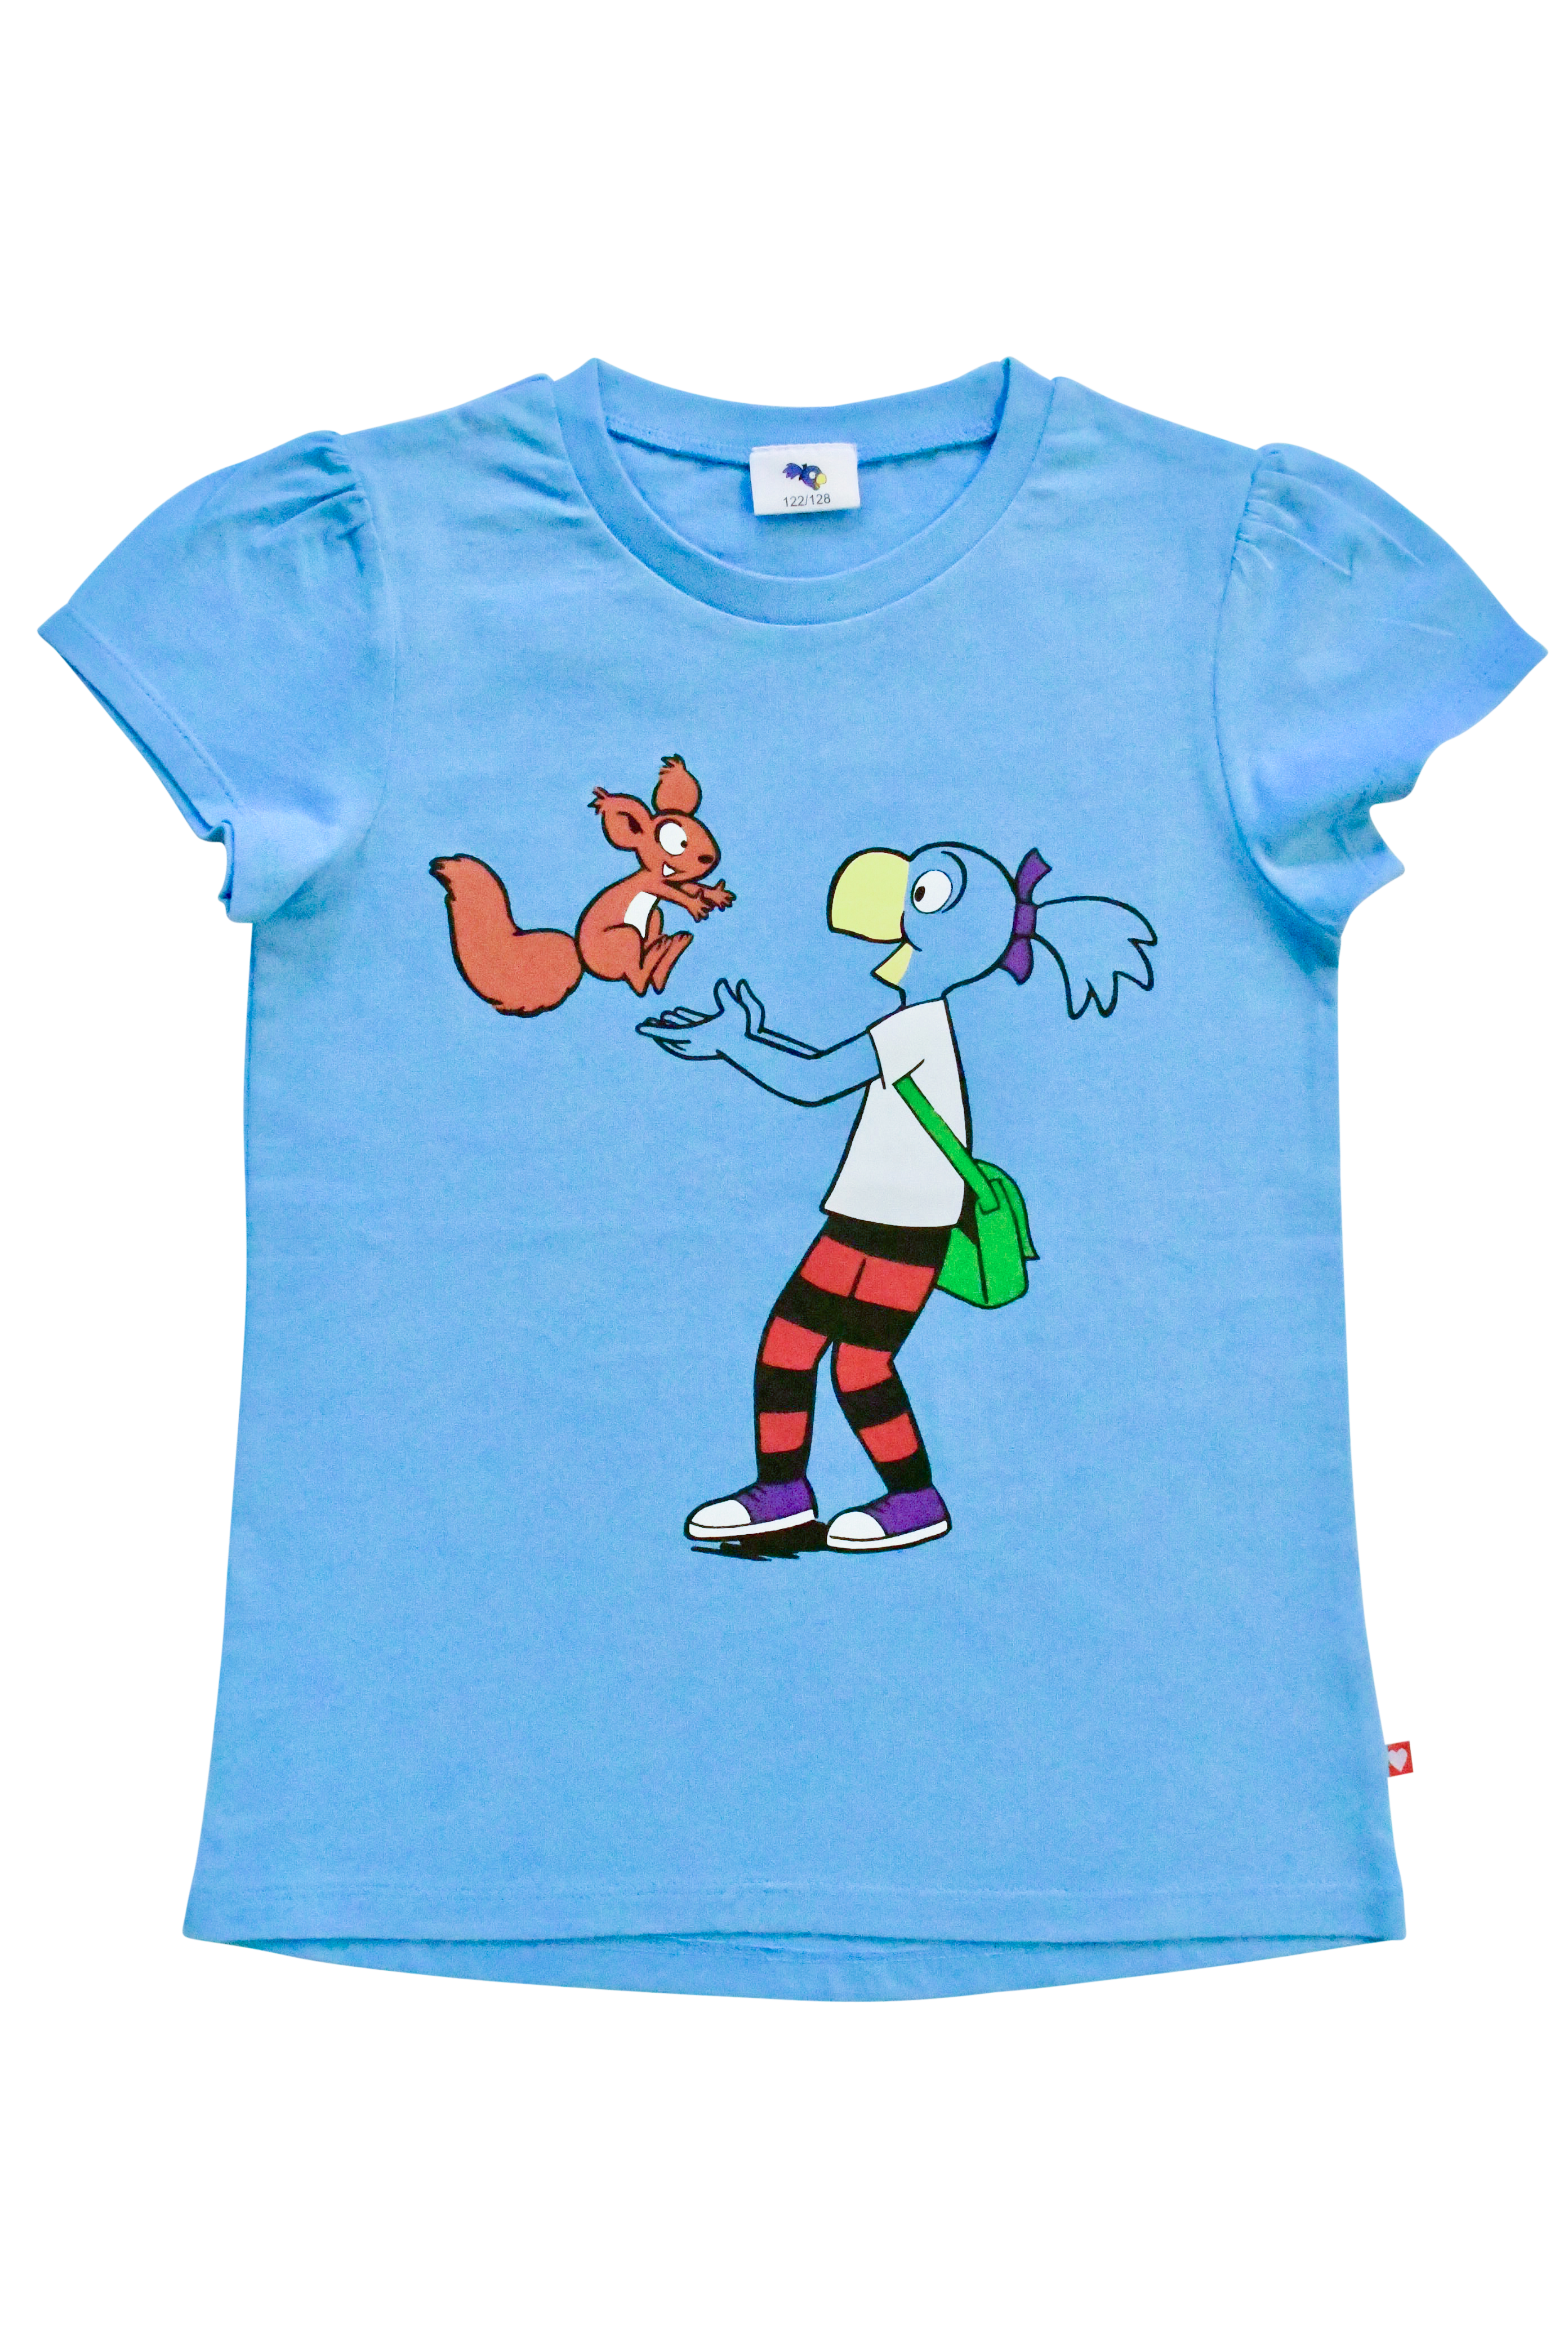 Globine T-Shirt blau stehend 122/128